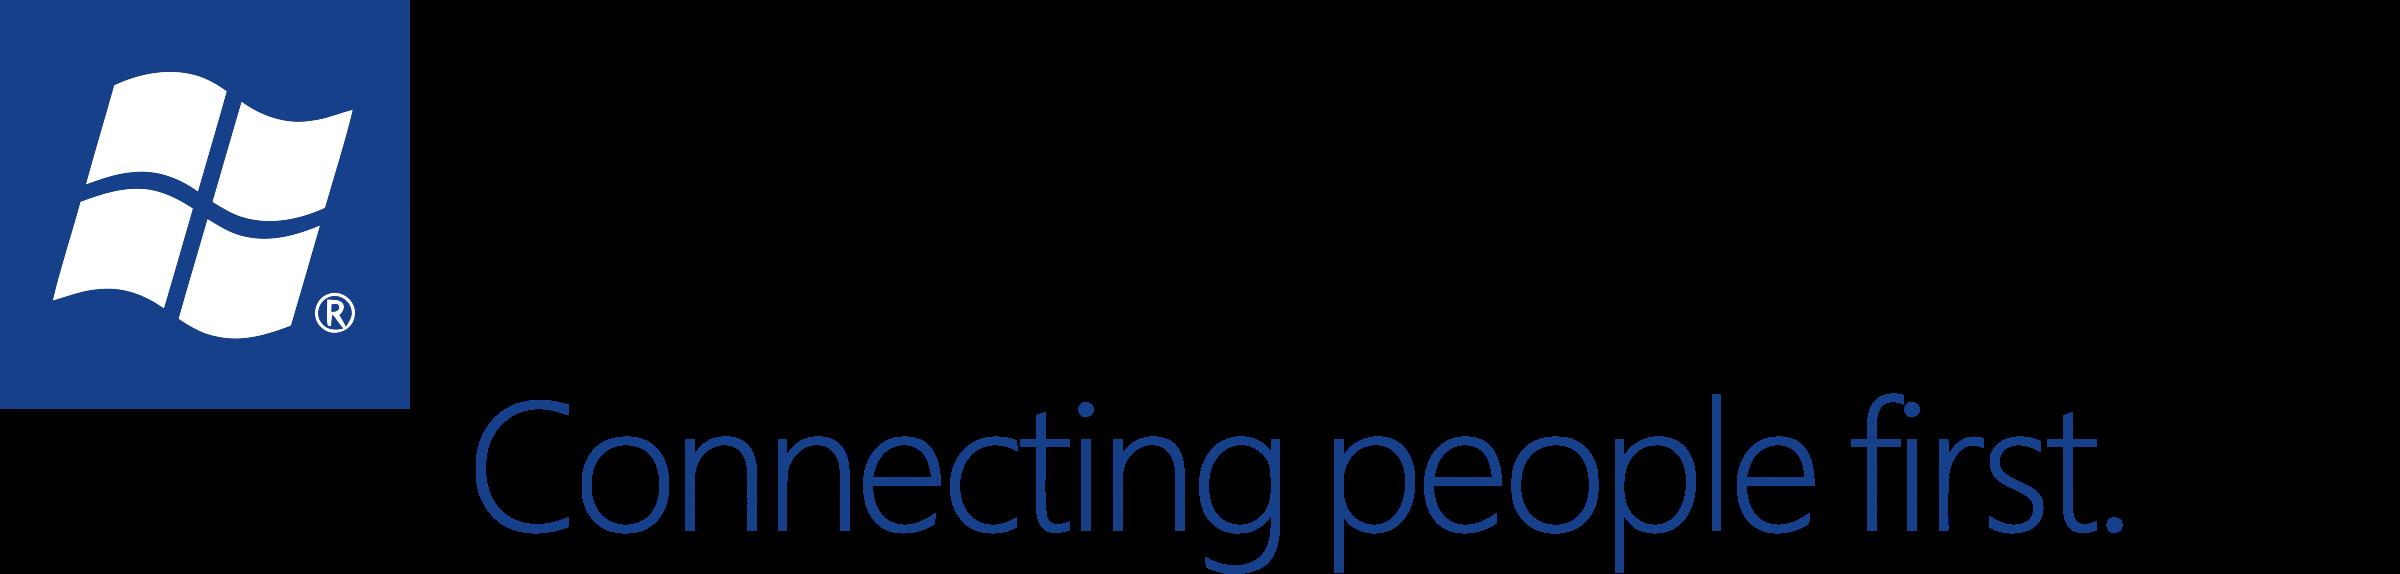 Nokia Lumia Logo PNG Transparent